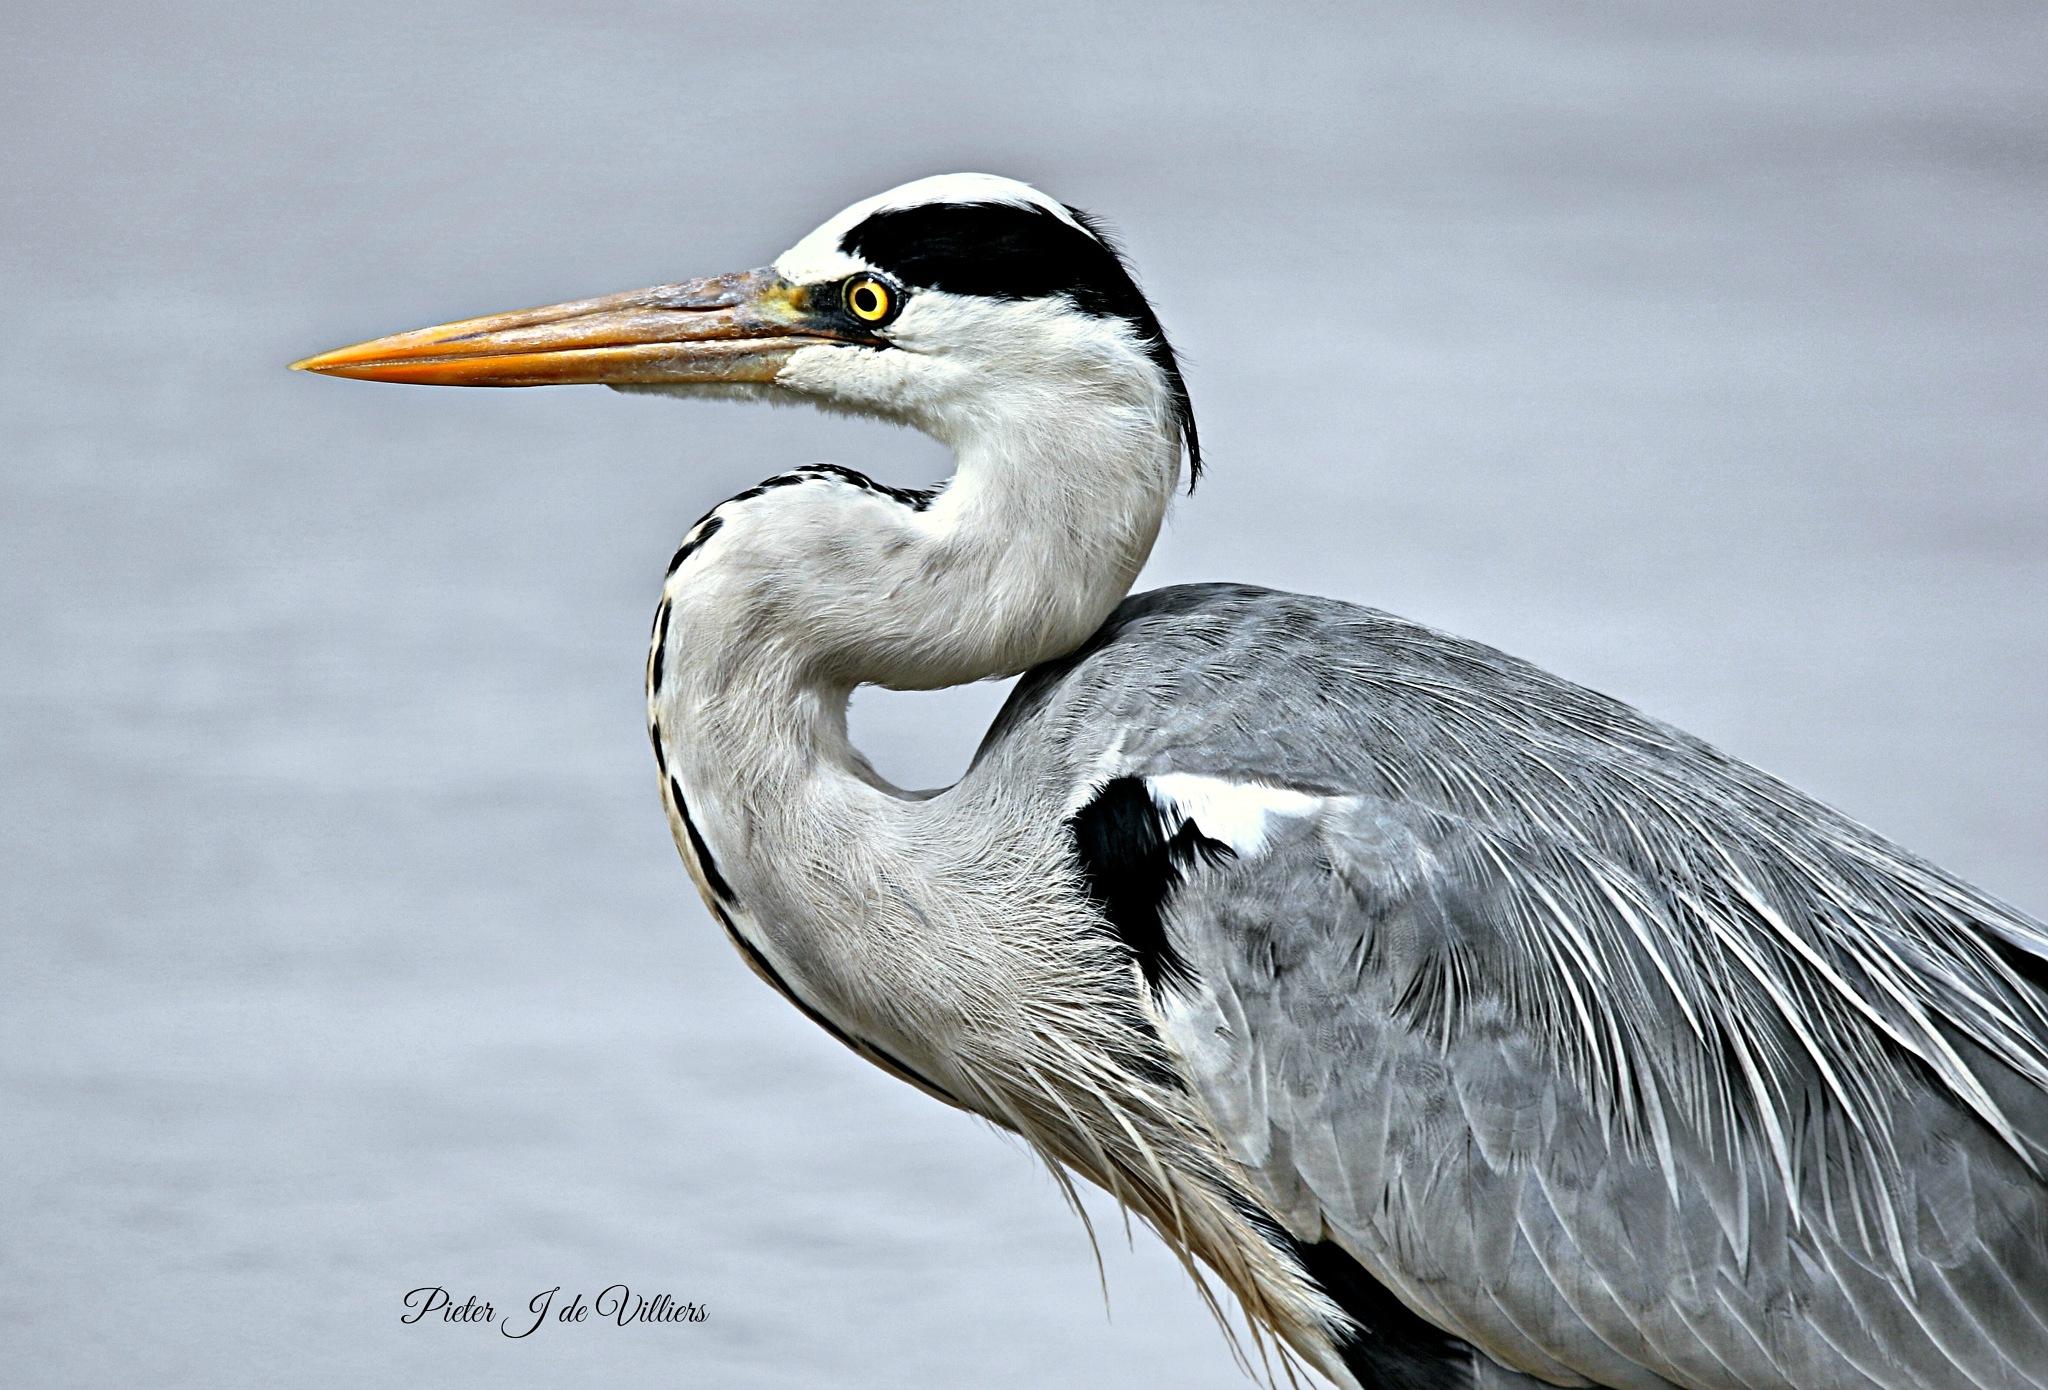 Grey Heron Close-up by Pieter J de Villiers